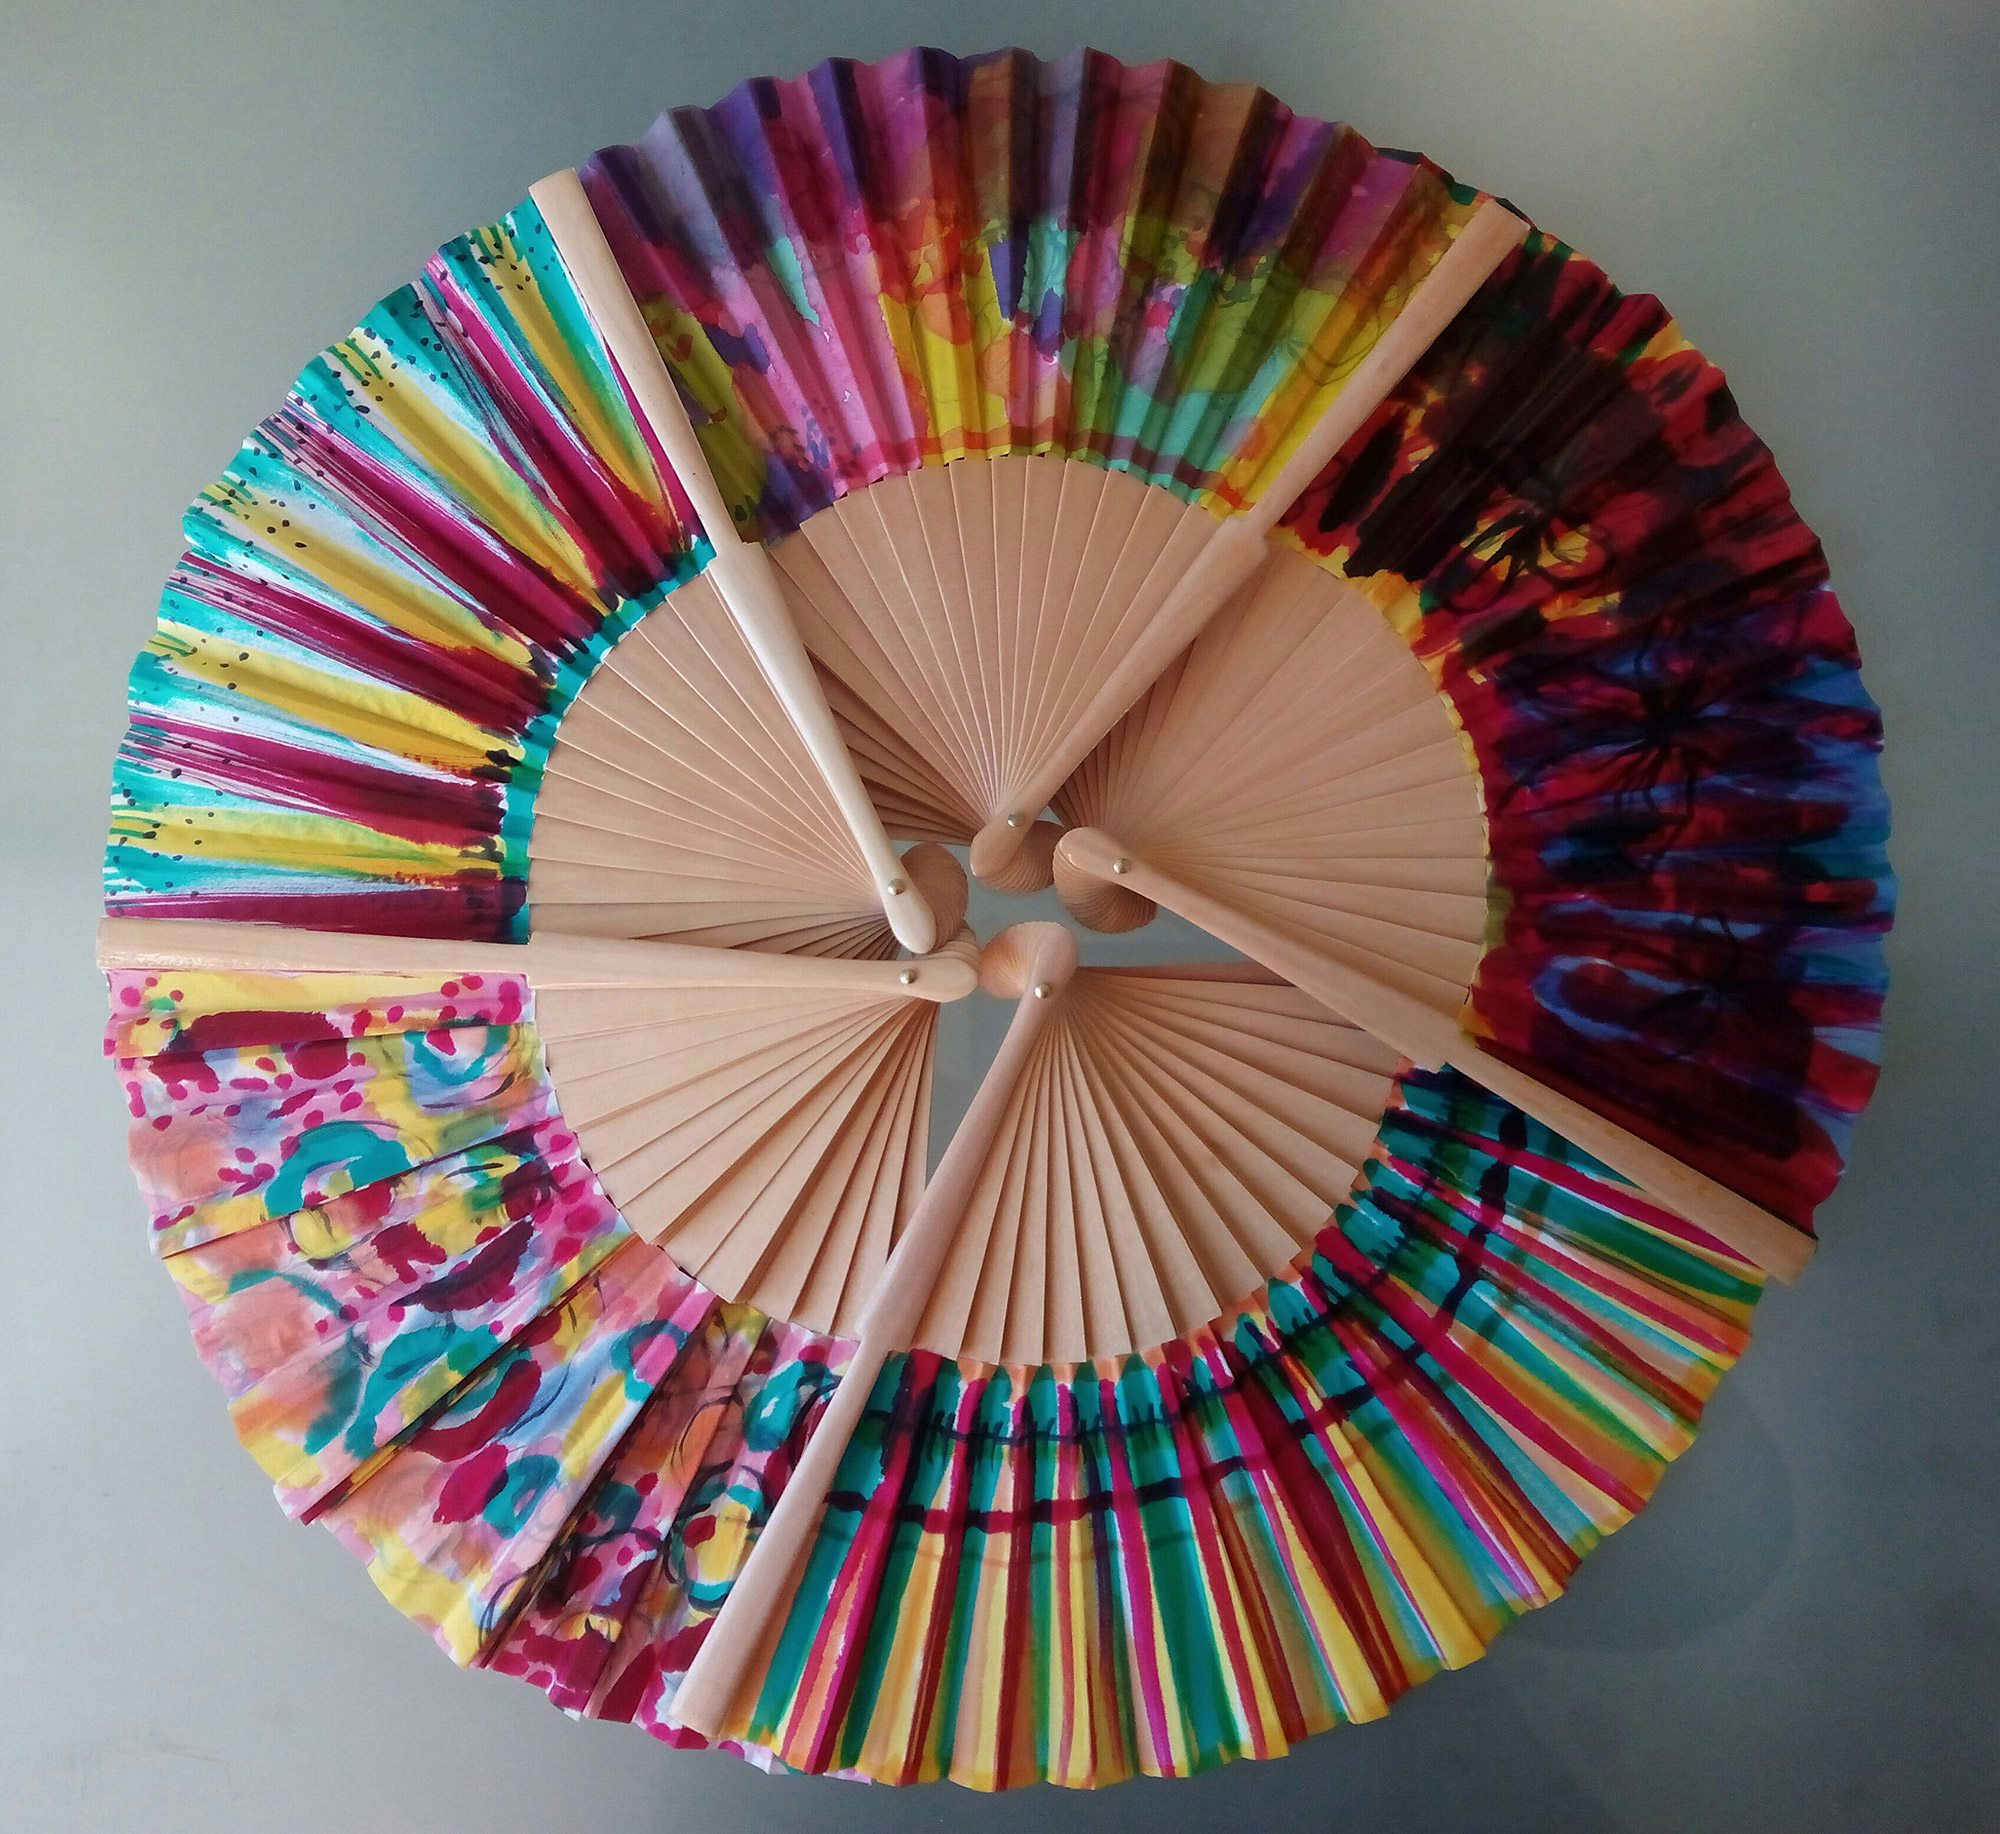 abanicos, diseño, creatividad, pintar